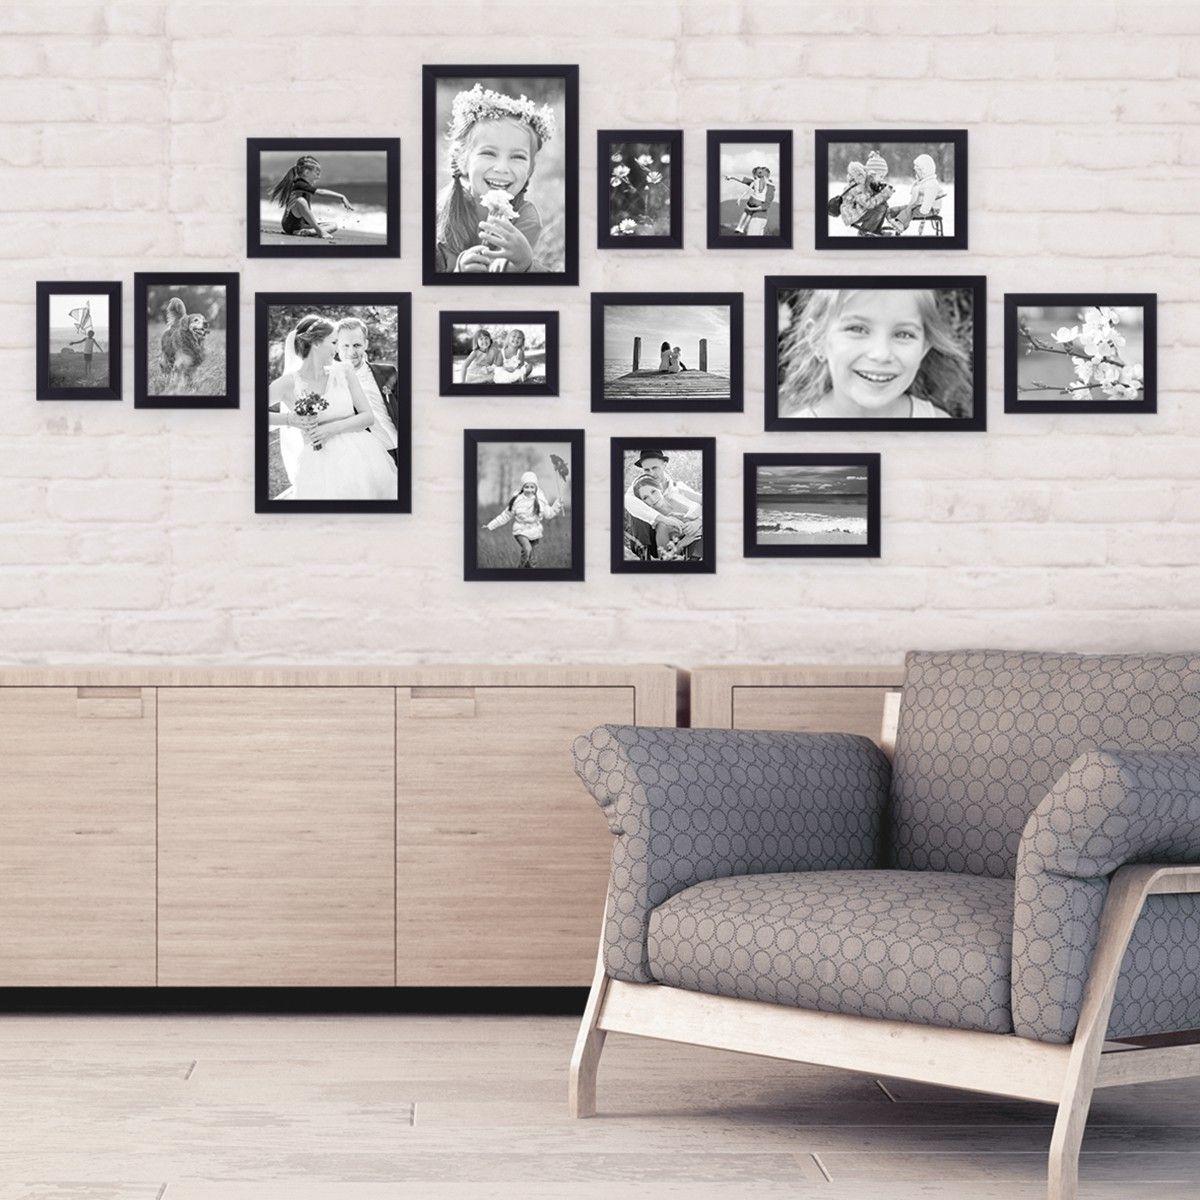 40++ Tapete bilderrahmen schwarz weiss 2021 ideen